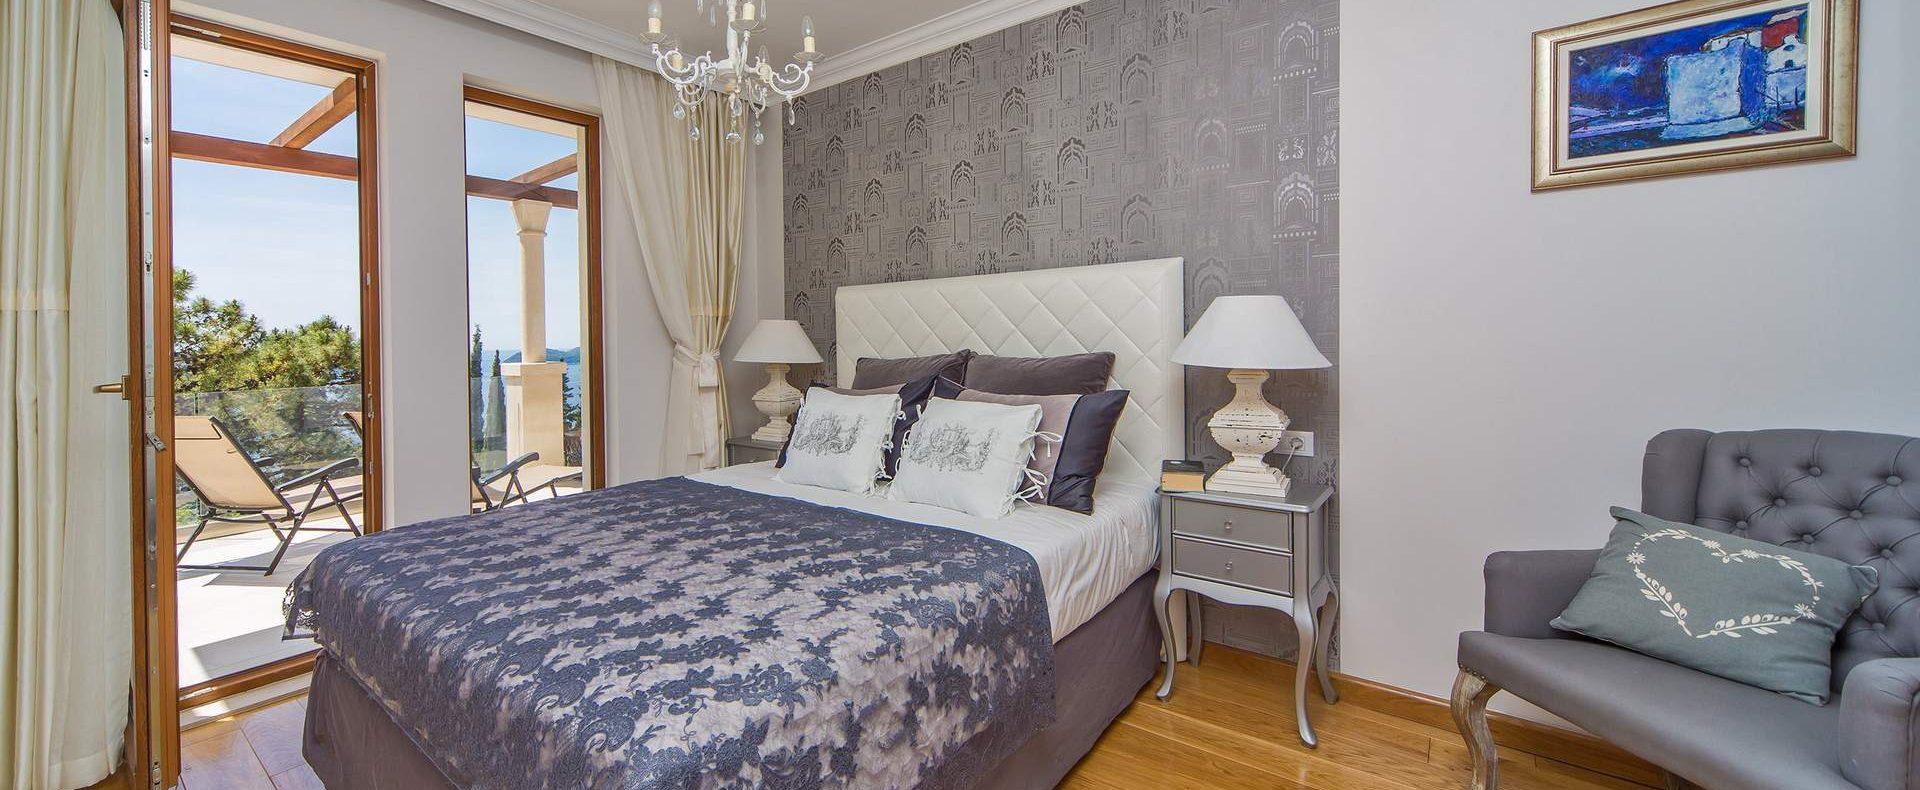 Dubrovnik Croatia bedroom with sea view